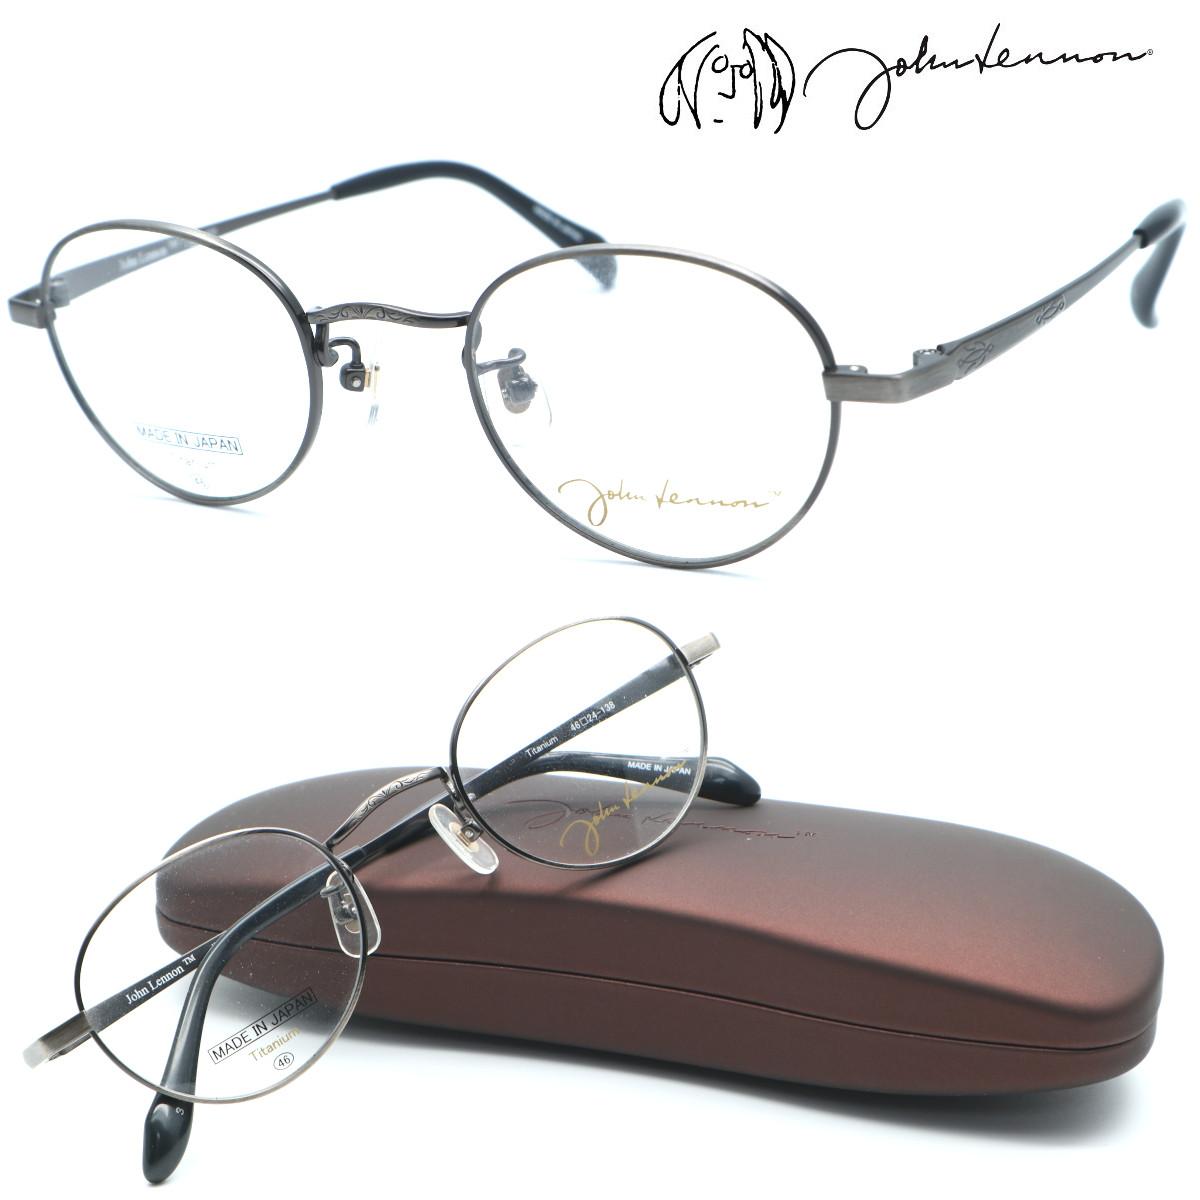 【john lennon】ジョンレノン JL-1025 col.3 メガネ 度付又は度無レンズセット  【正規品】【店内全品送料無料】【丸メガネ】